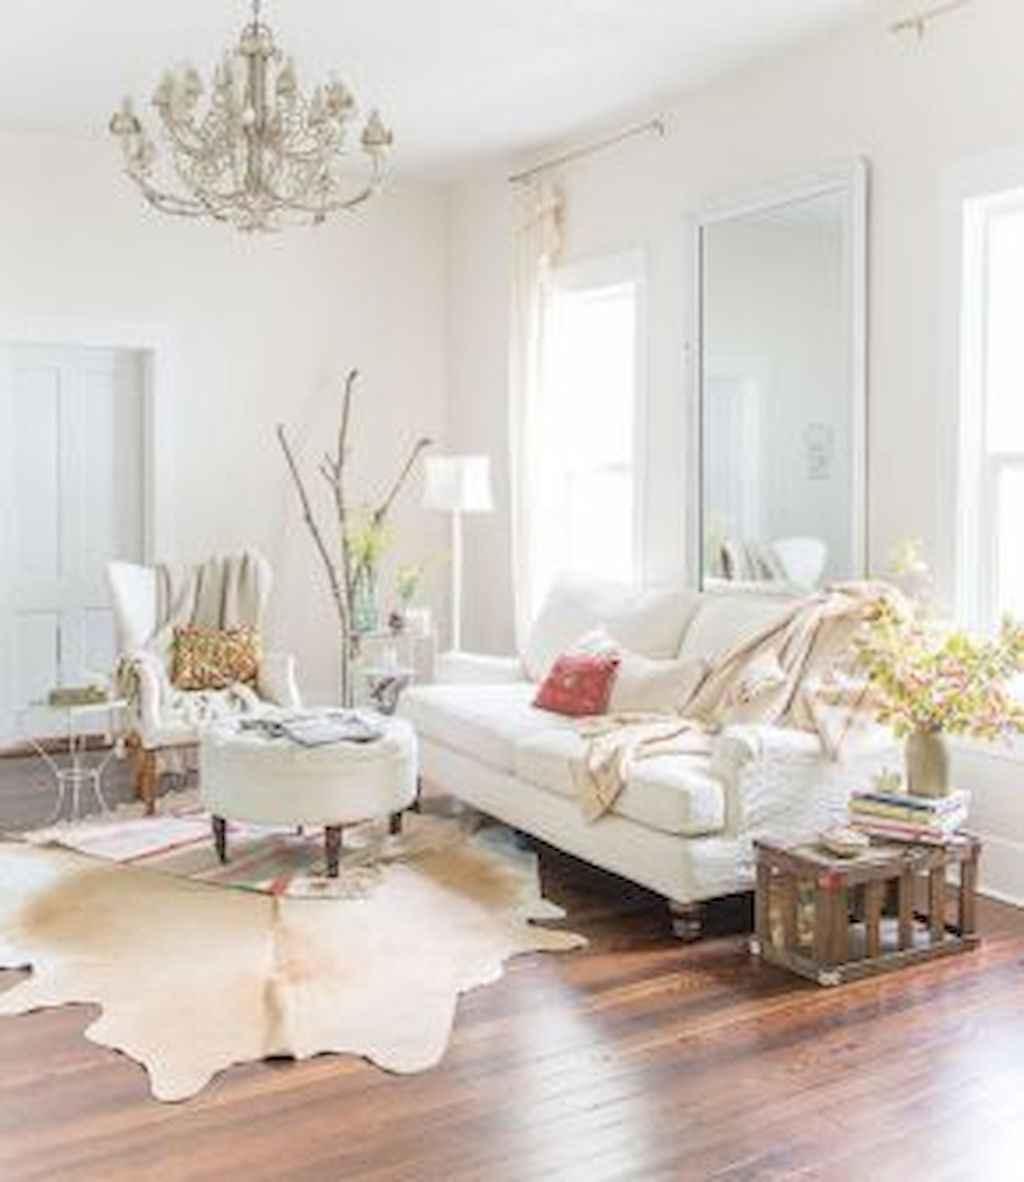 Romantic shabby chic living room decoration ideas (5)